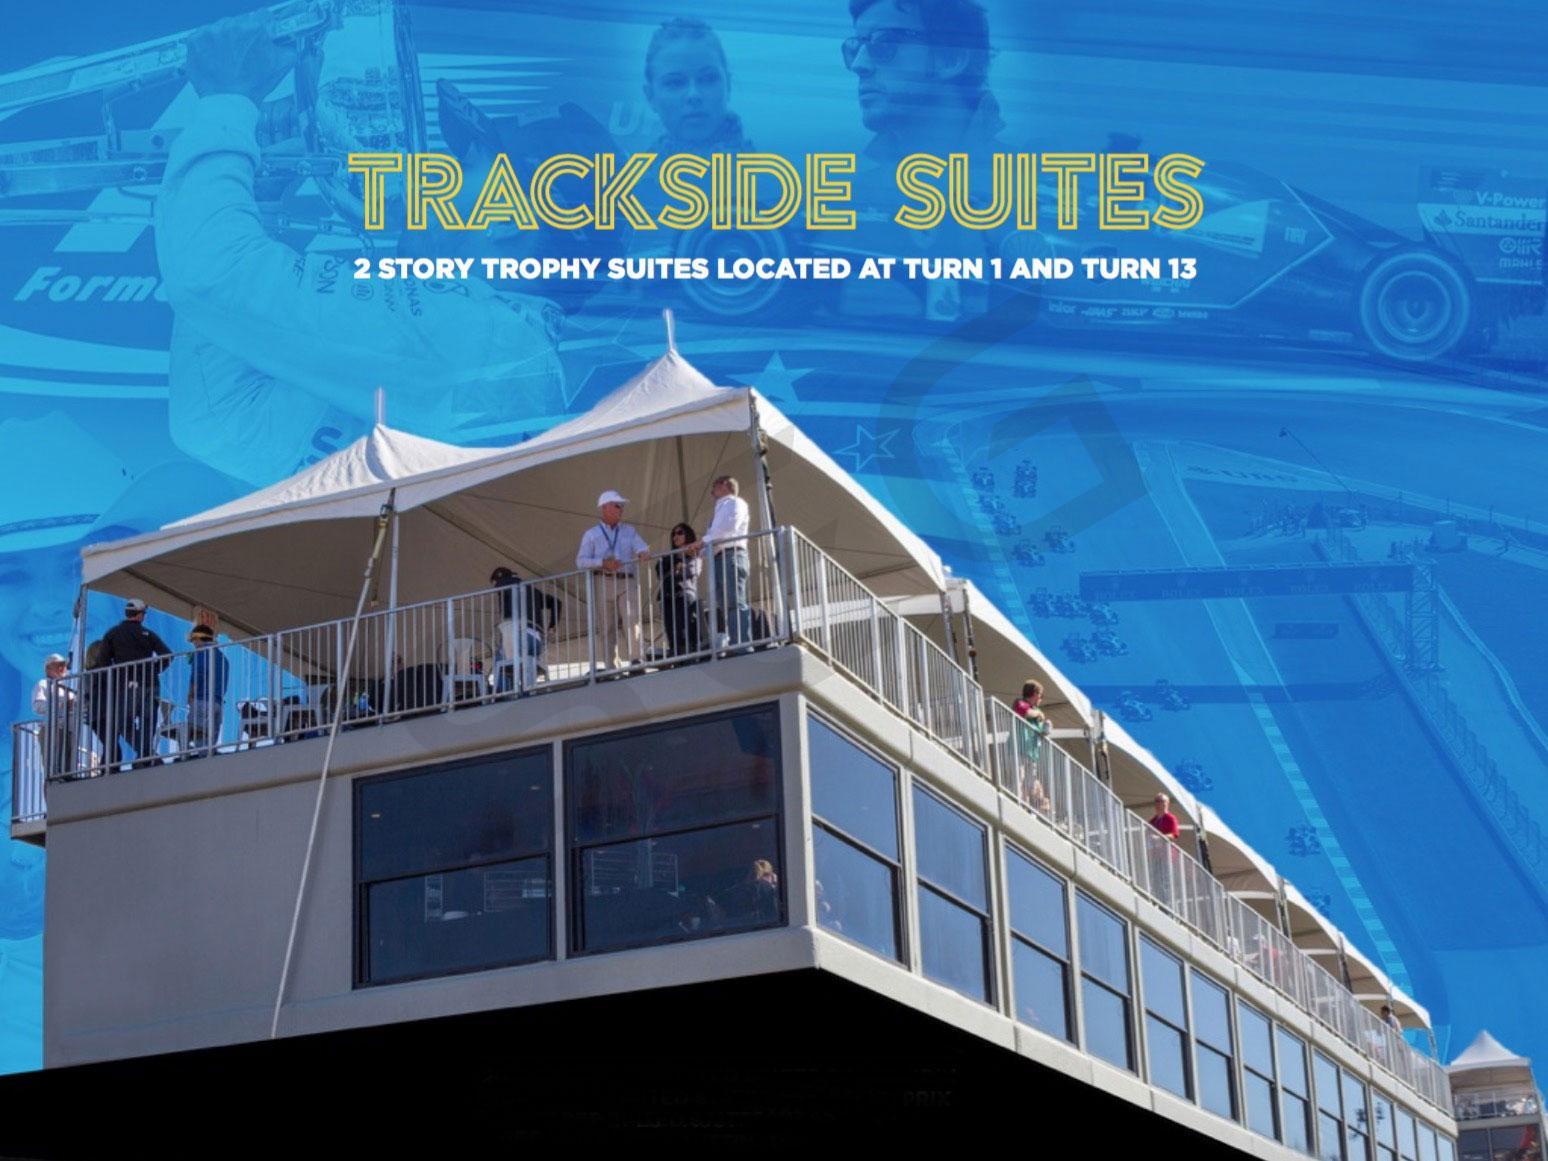 Trackside Suites